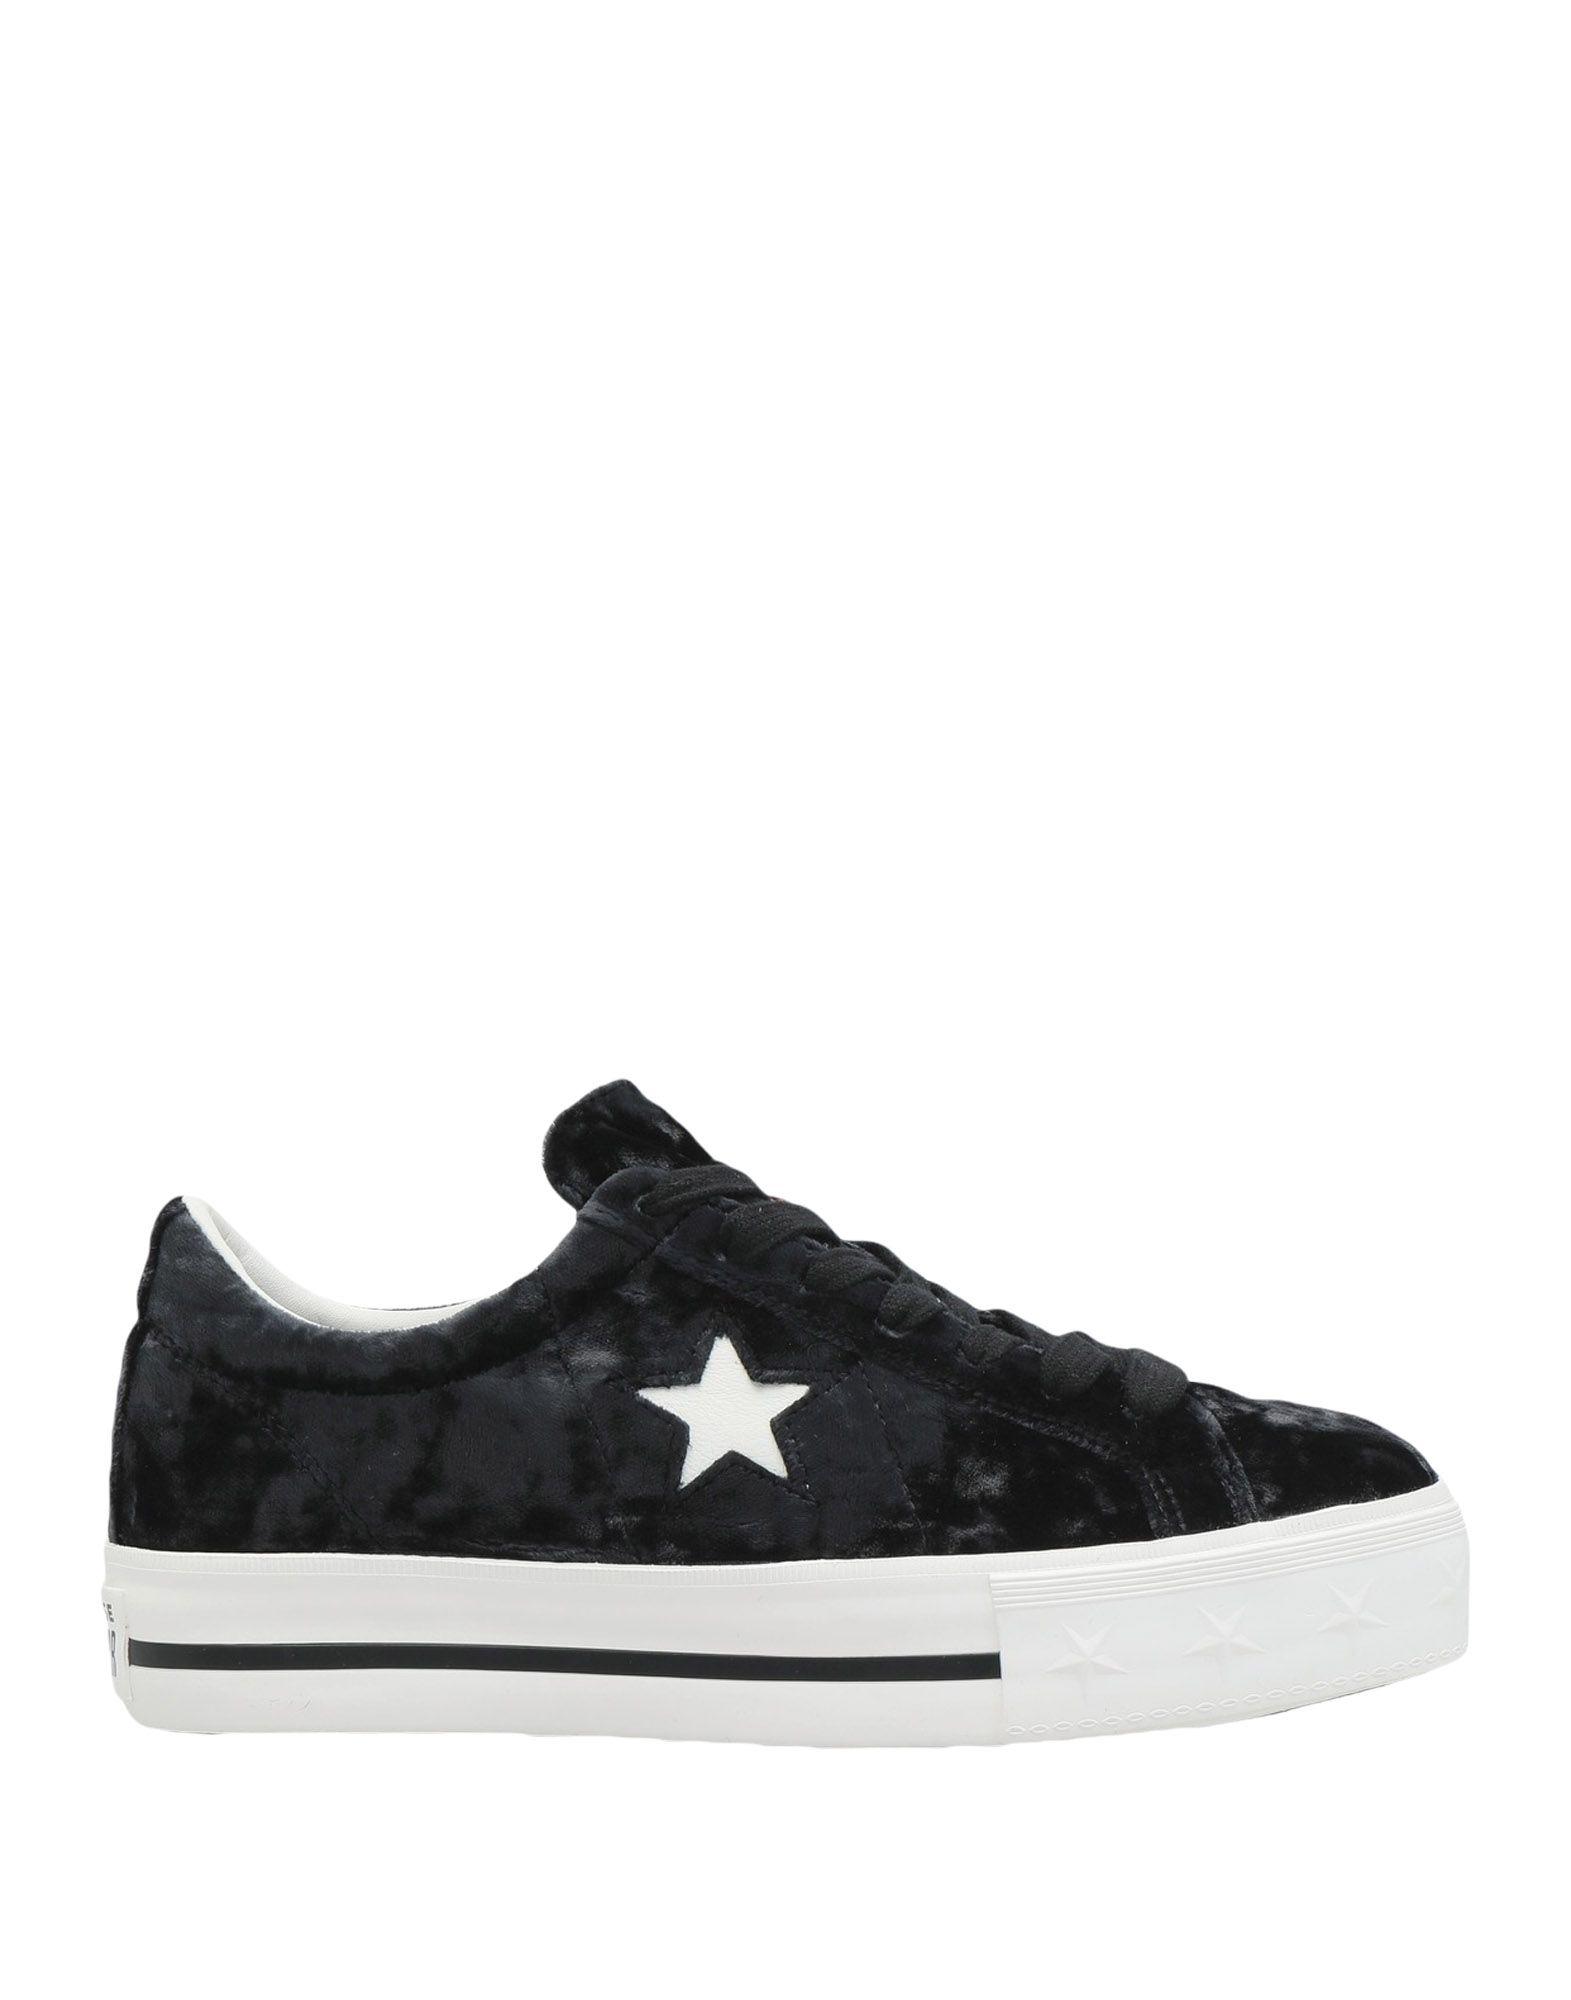 Converse One Star One Star Platform Platform Platform  11594799HS Gute Qualität beliebte Schuhe a42ab0